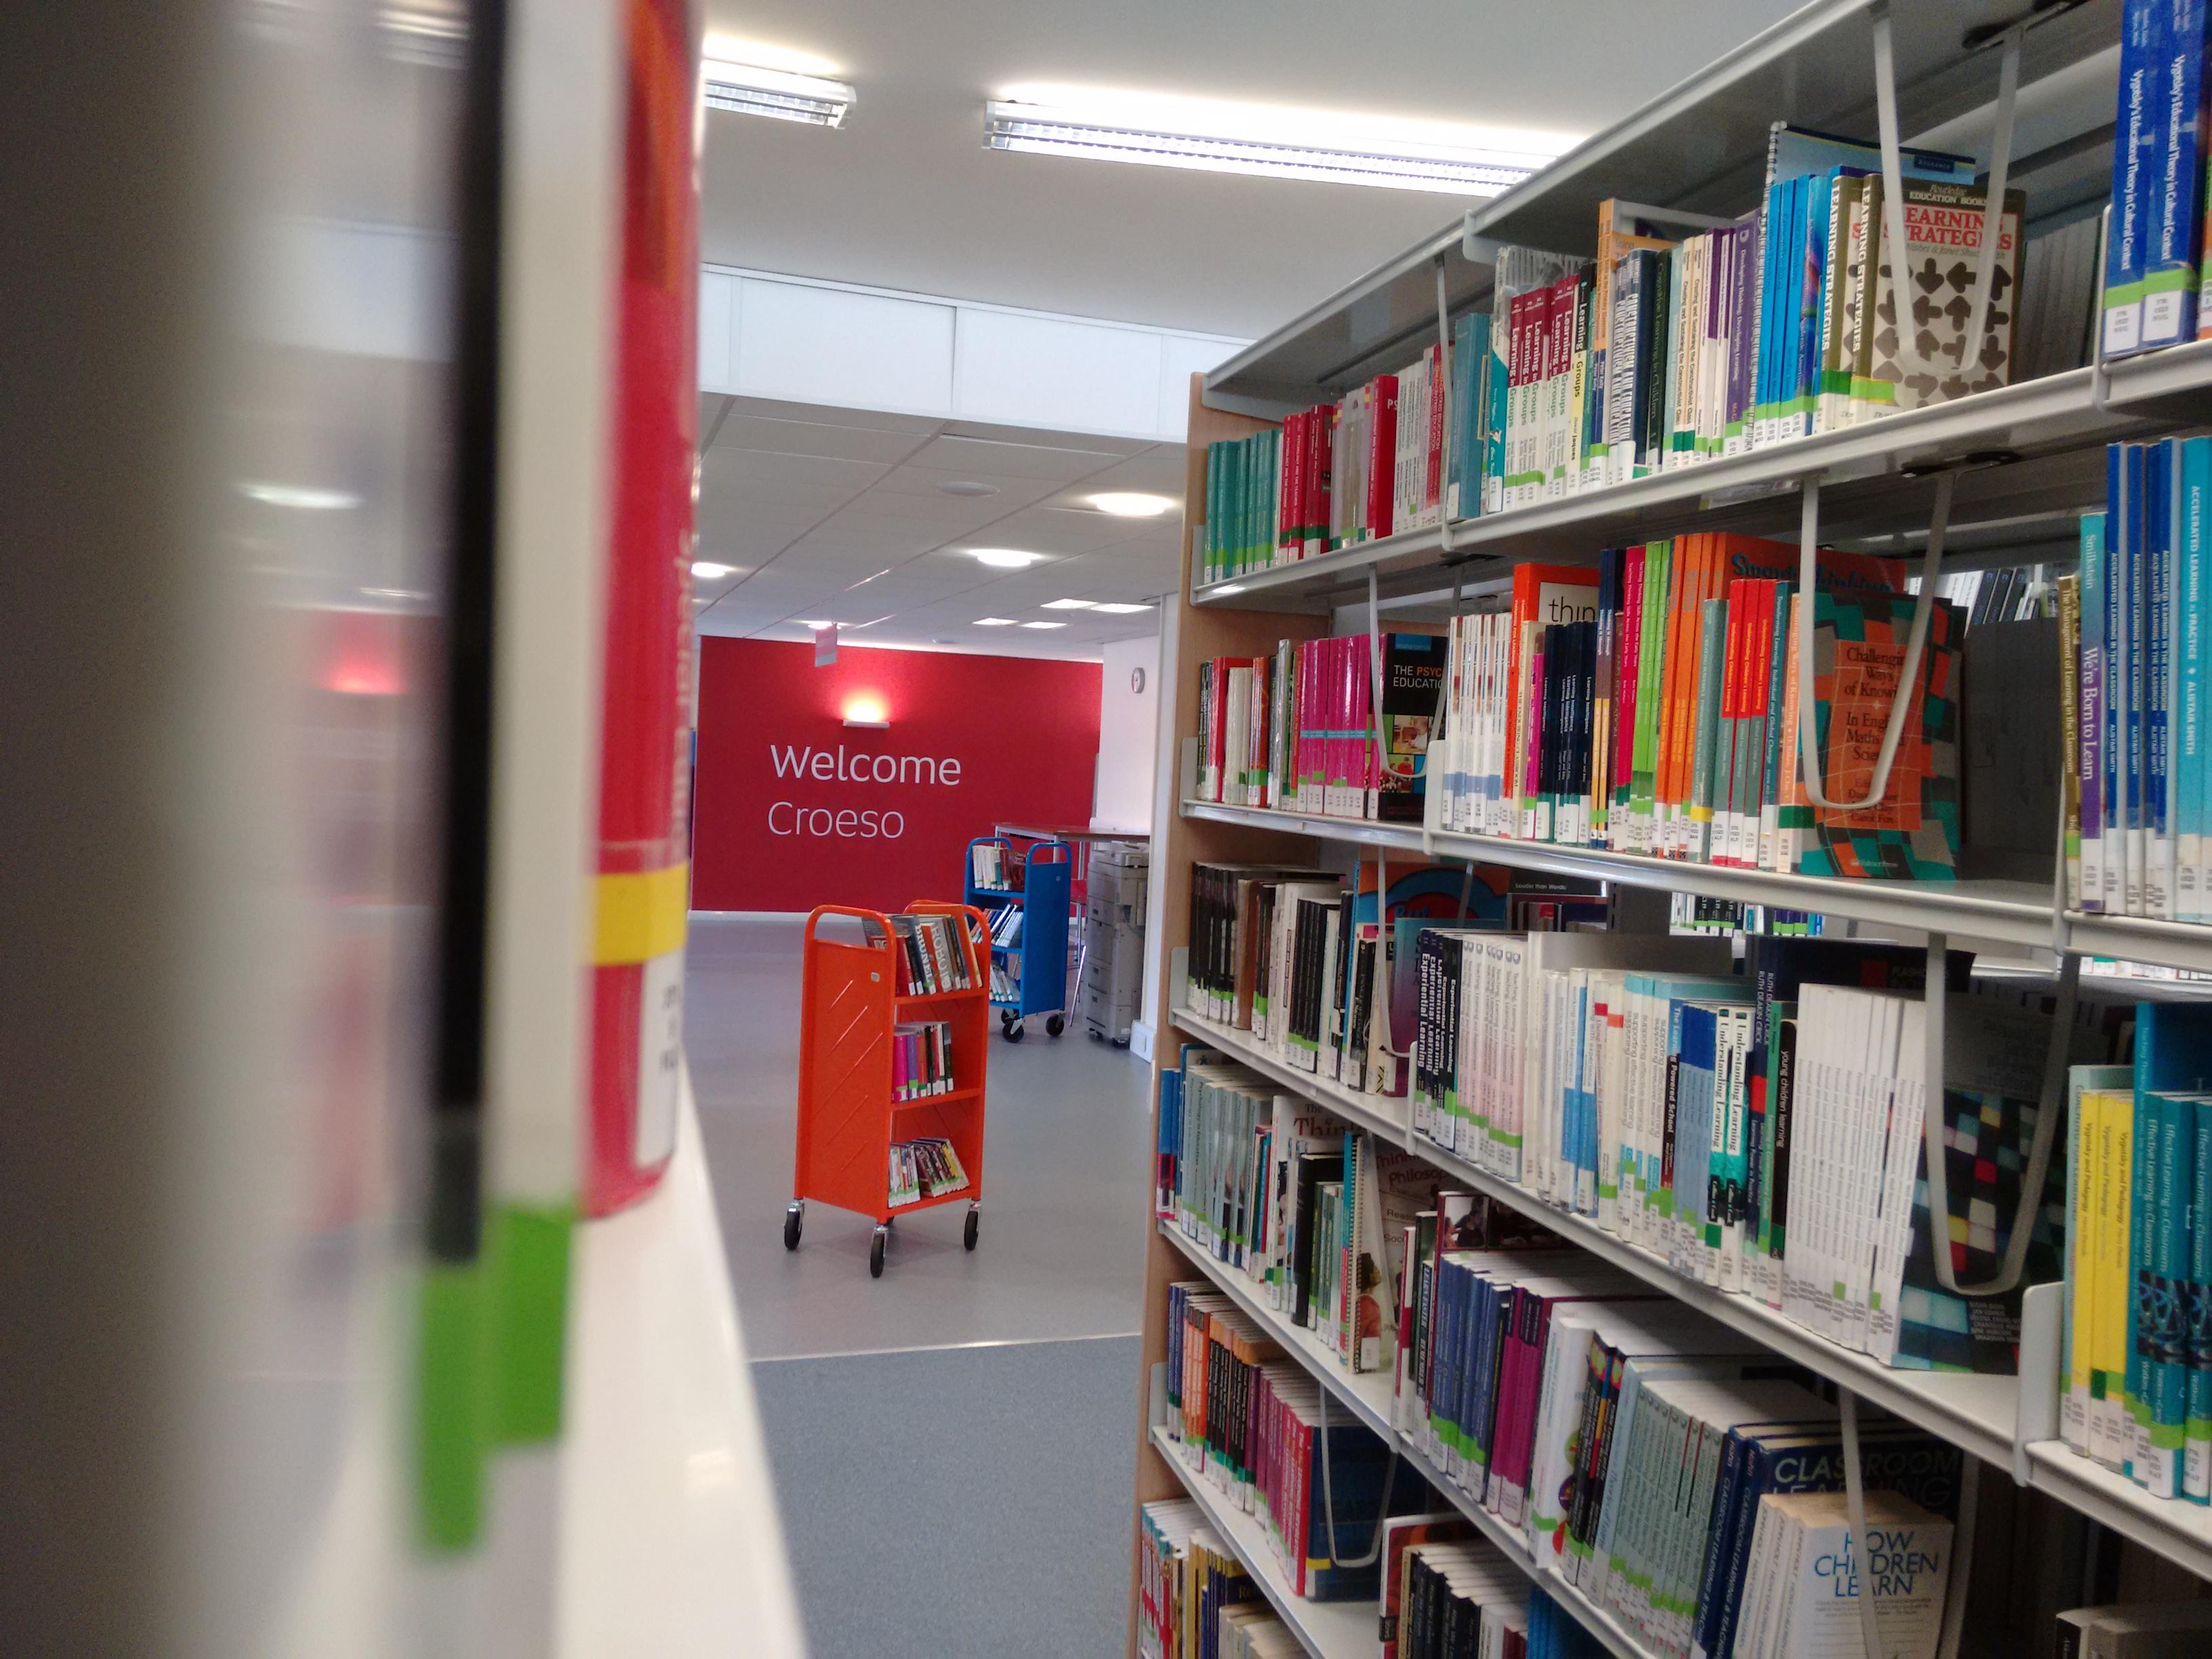 Cardiff Metropolitan University Library